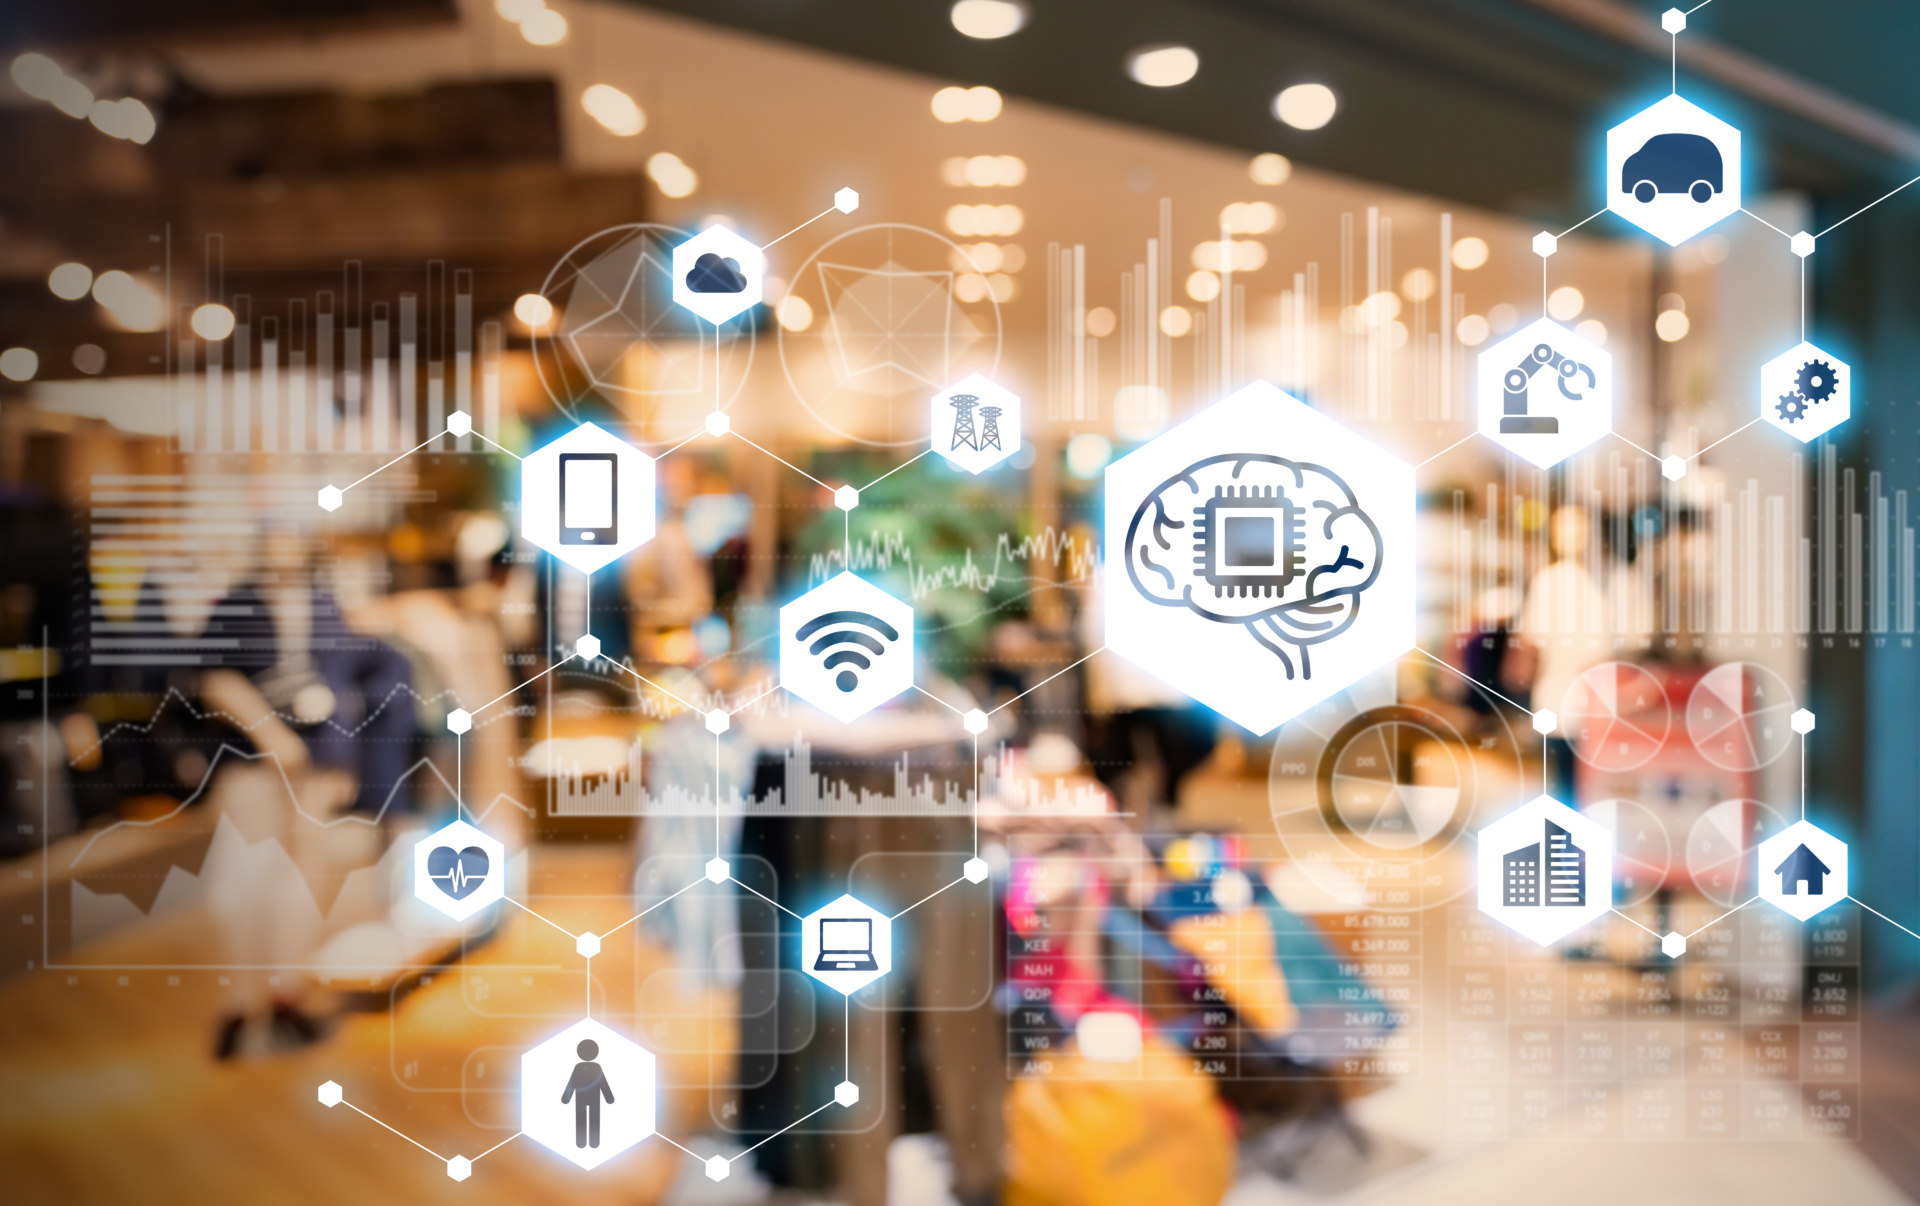 Smart Regulation of Digital & Network Technology